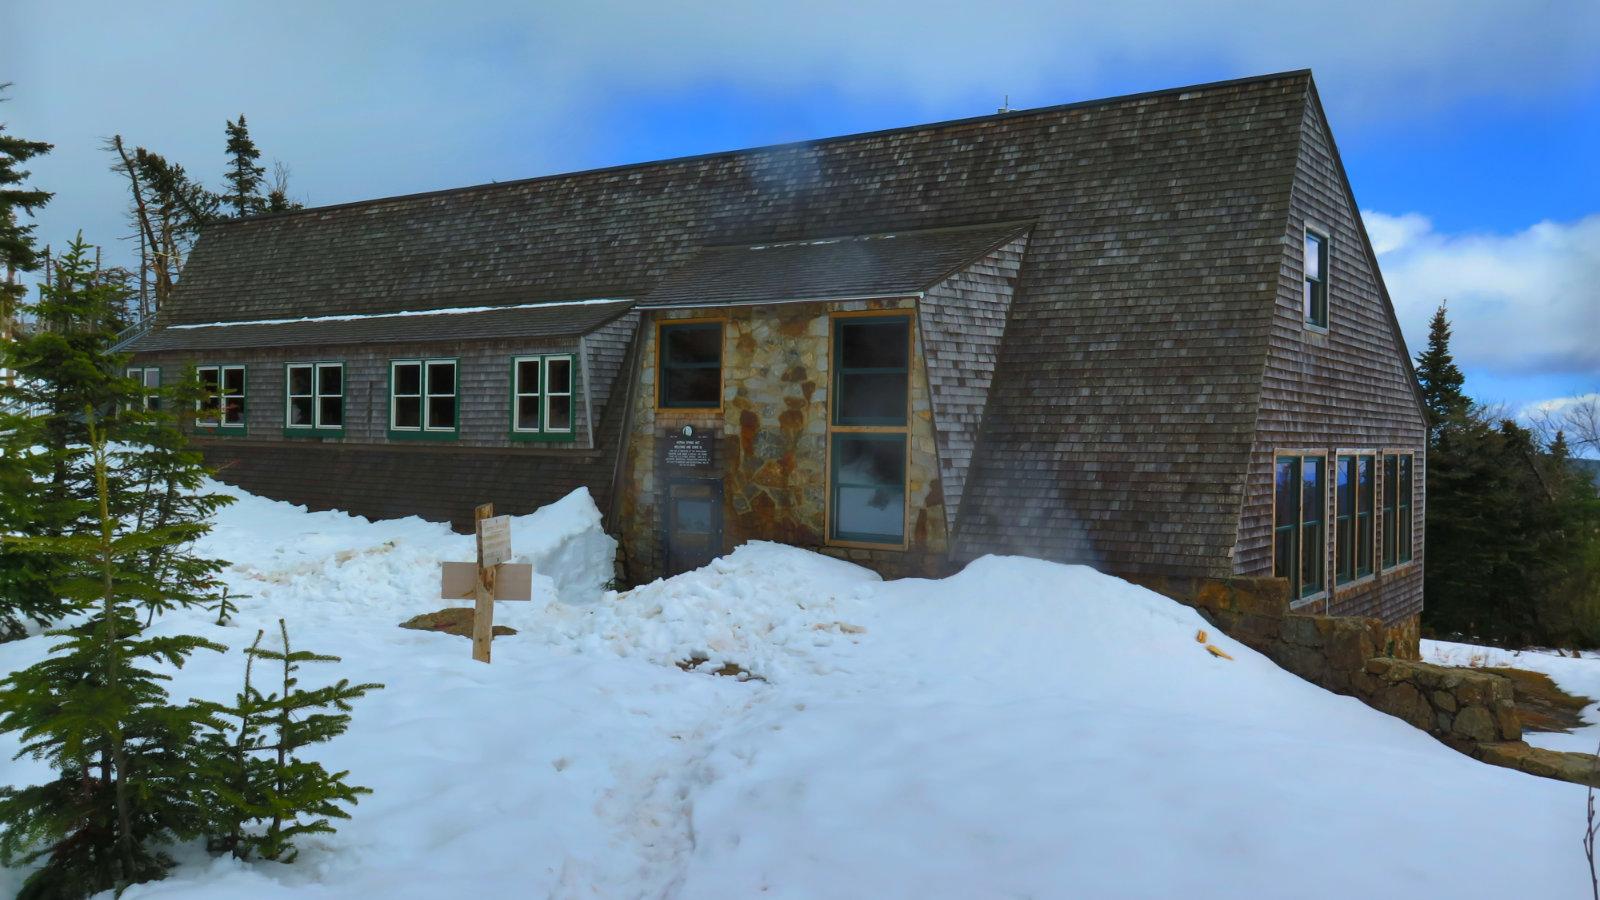 Mitzpah-Spring-Hut-20180501